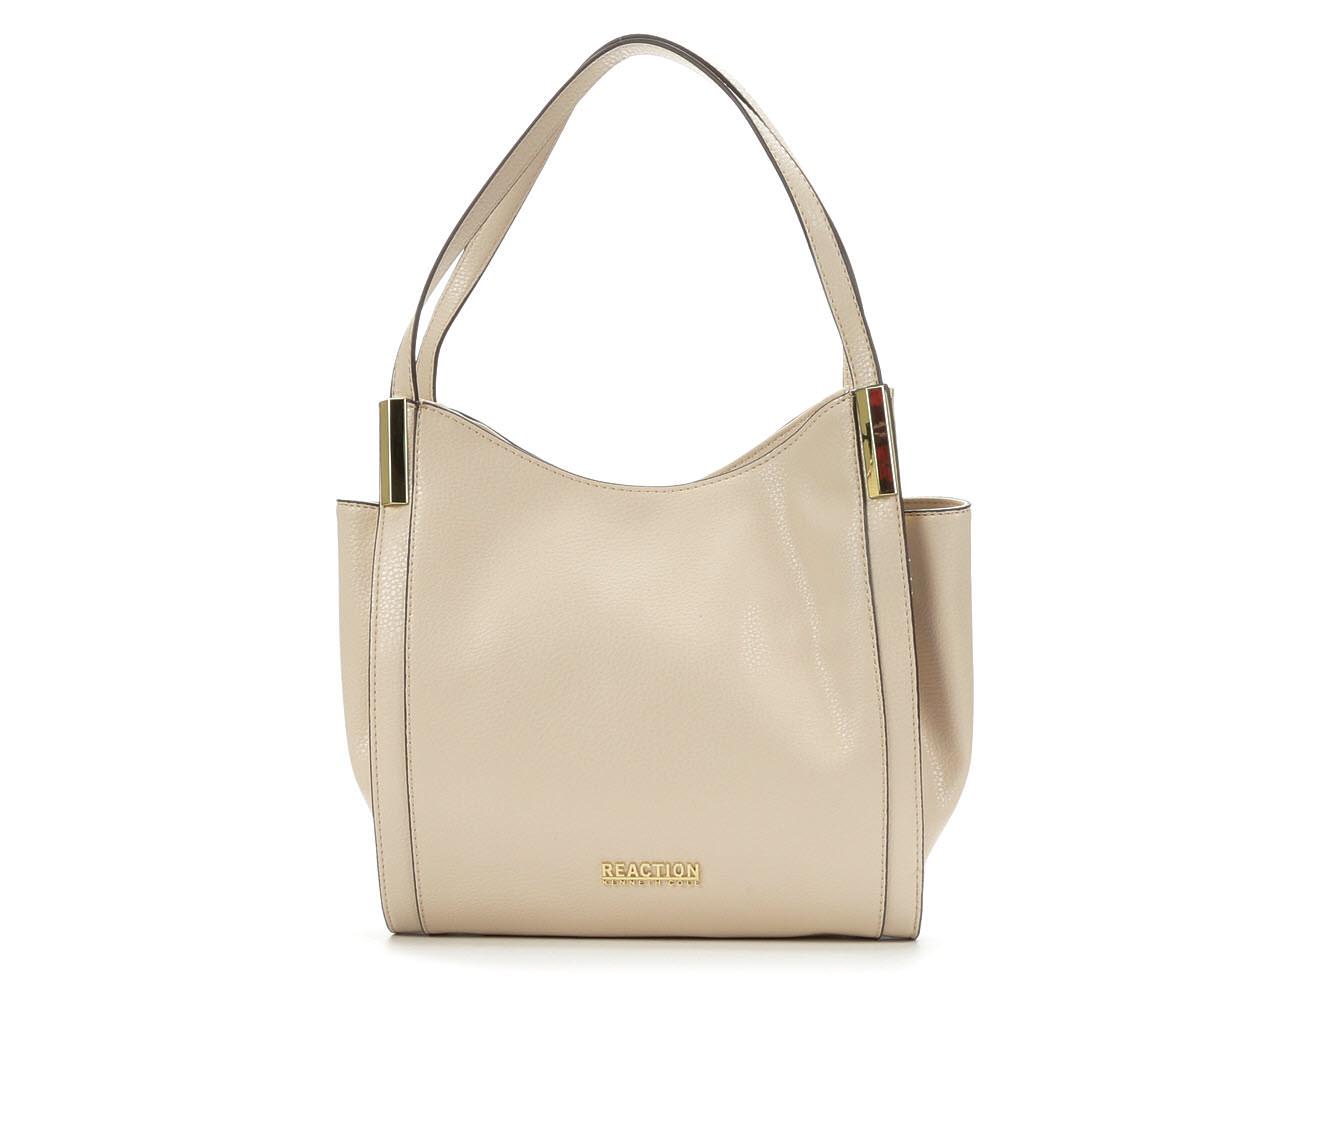 Kenneth Cole Reaction Hobo Handbag (Beige)